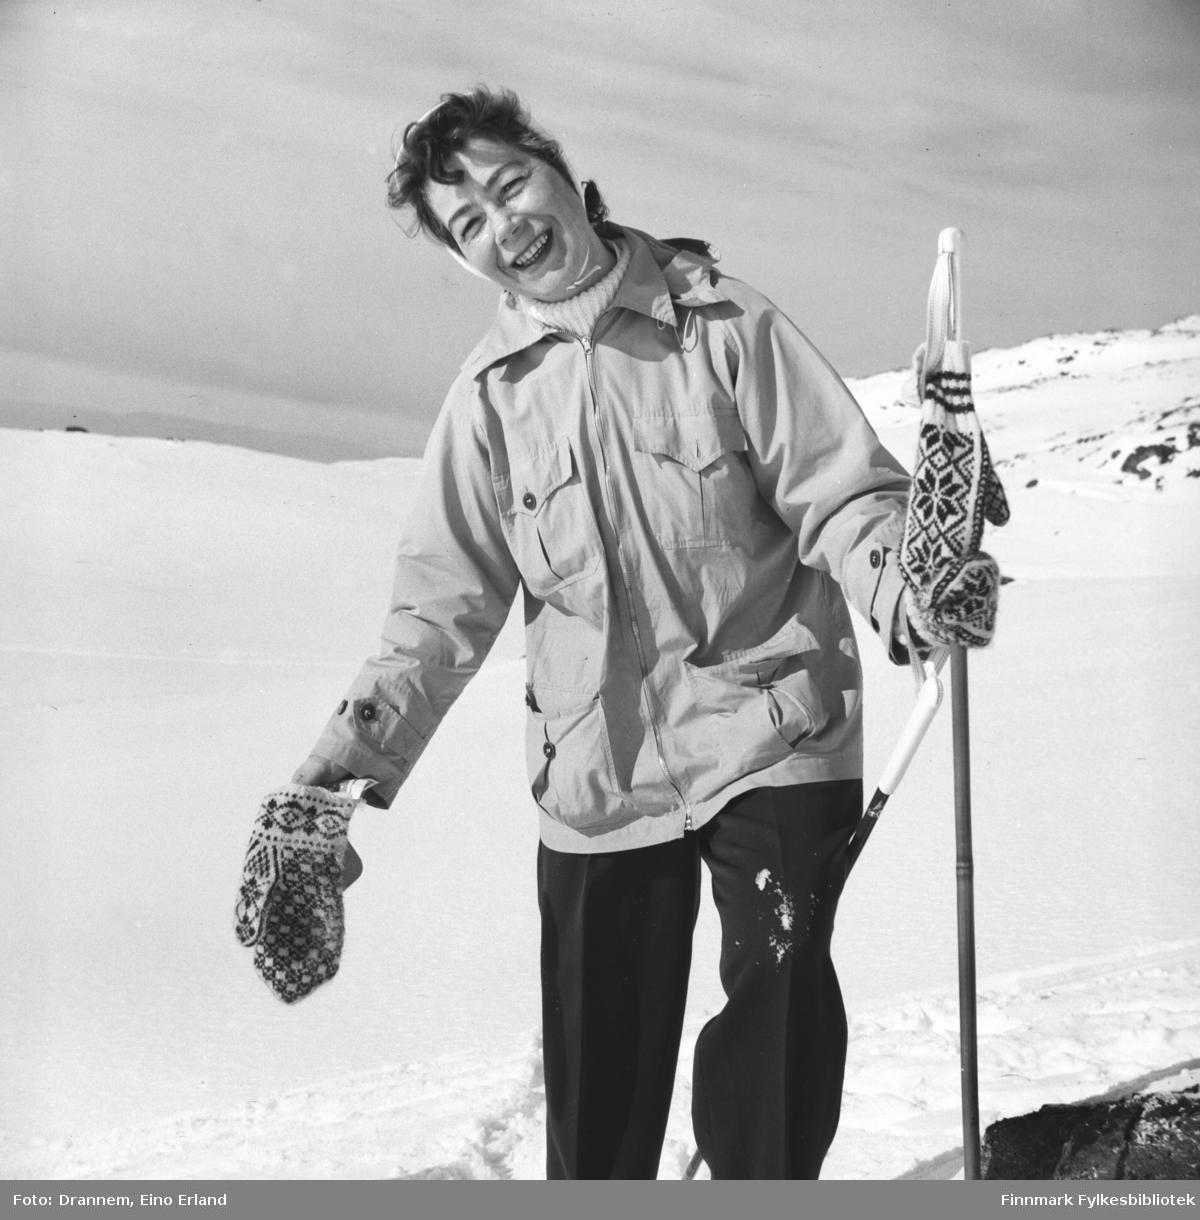 Påsketid. Jenny Drannem på skitur